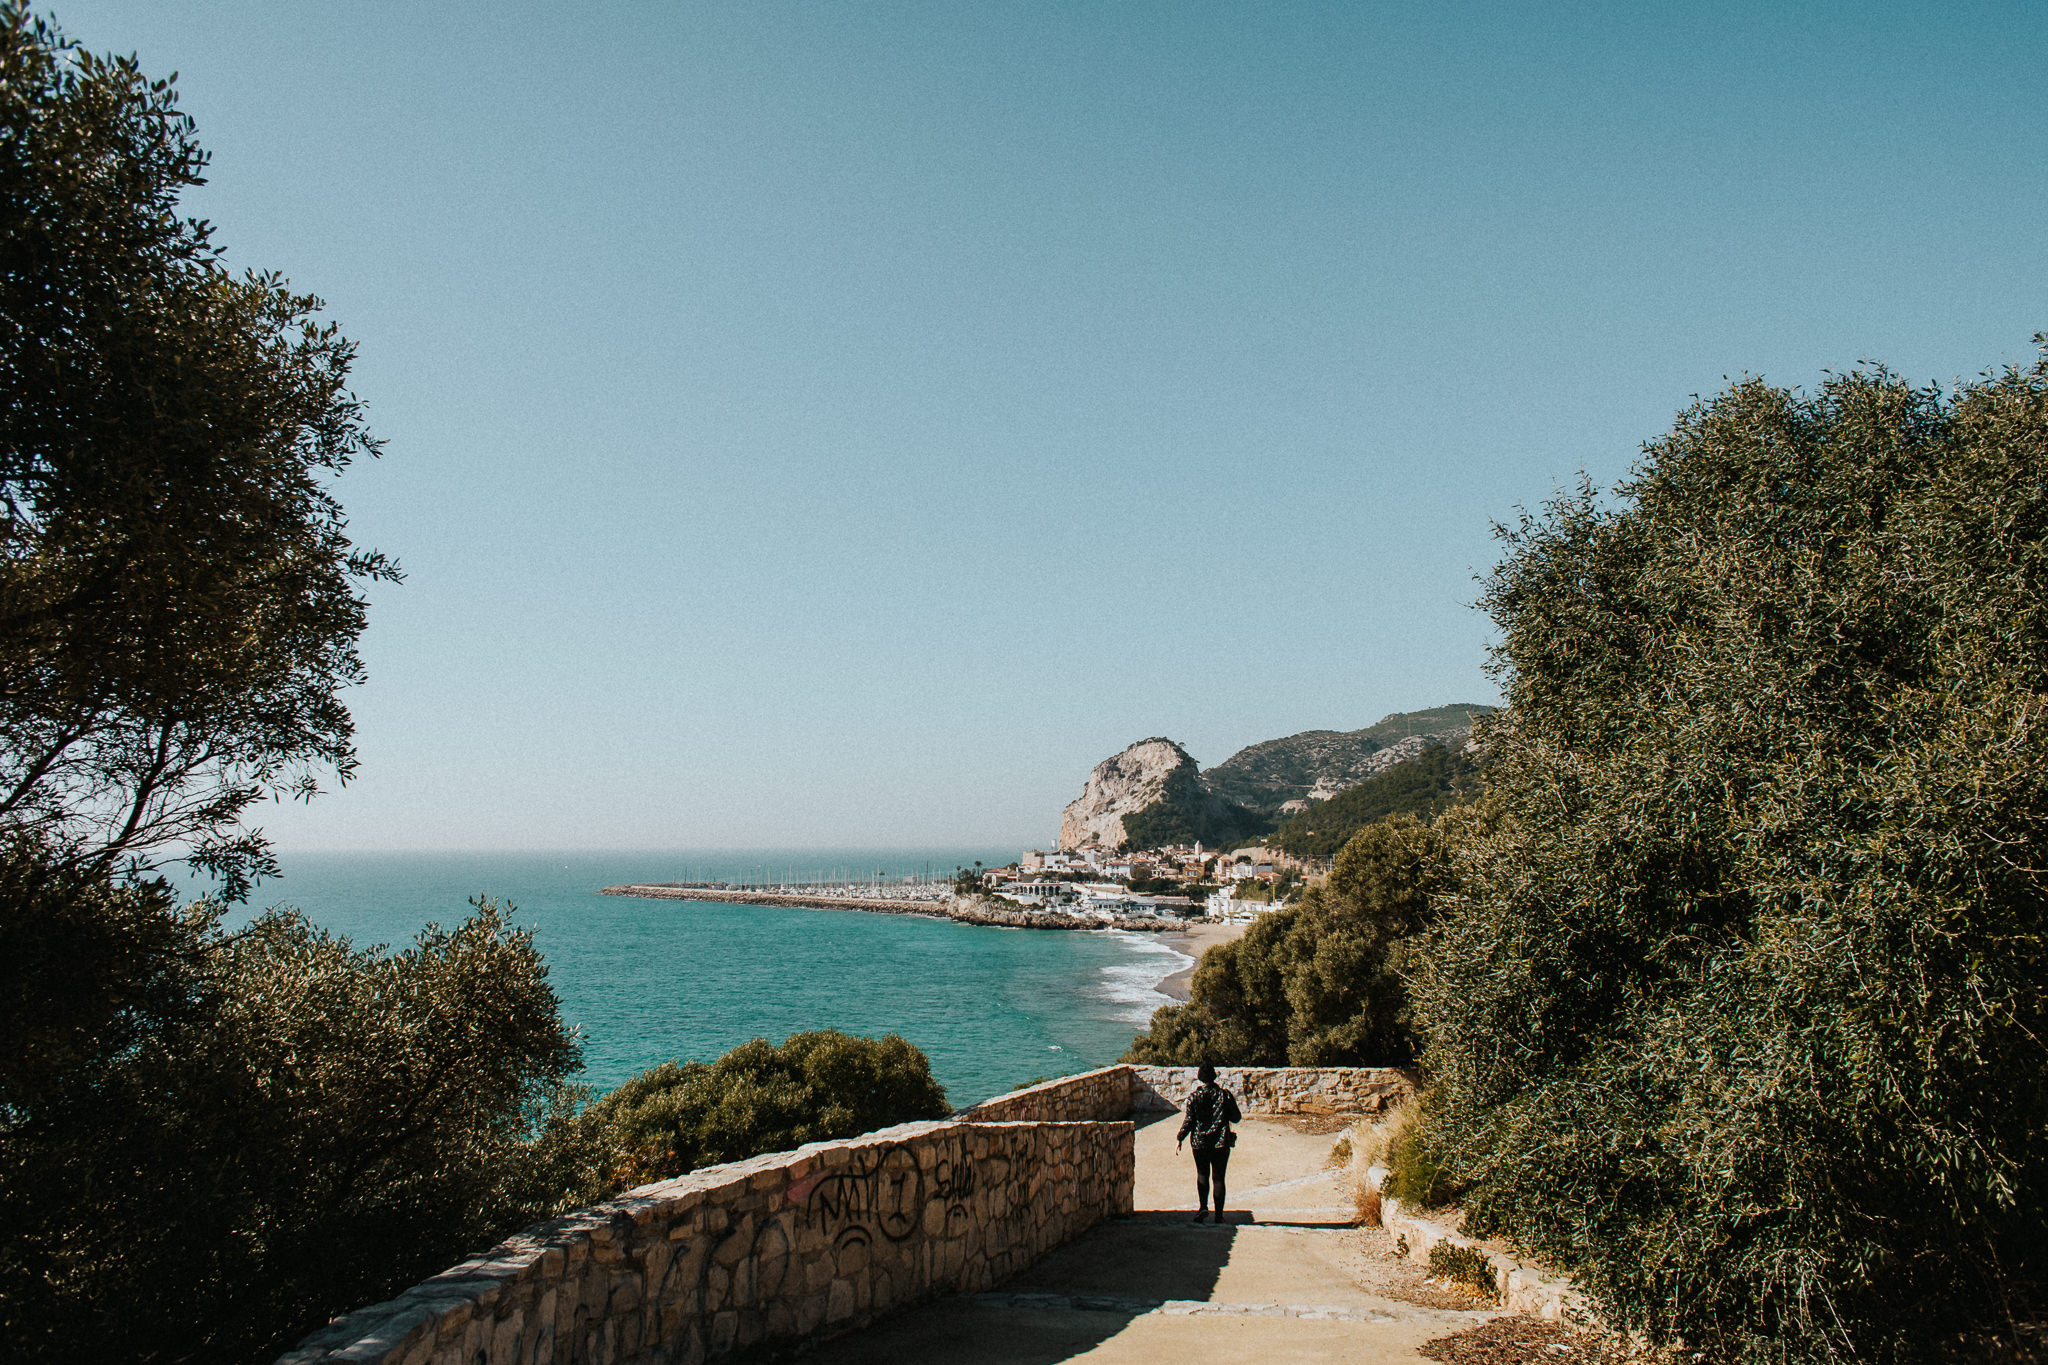 Barcelona-destination-photographer-alfred-tang-99.jpg